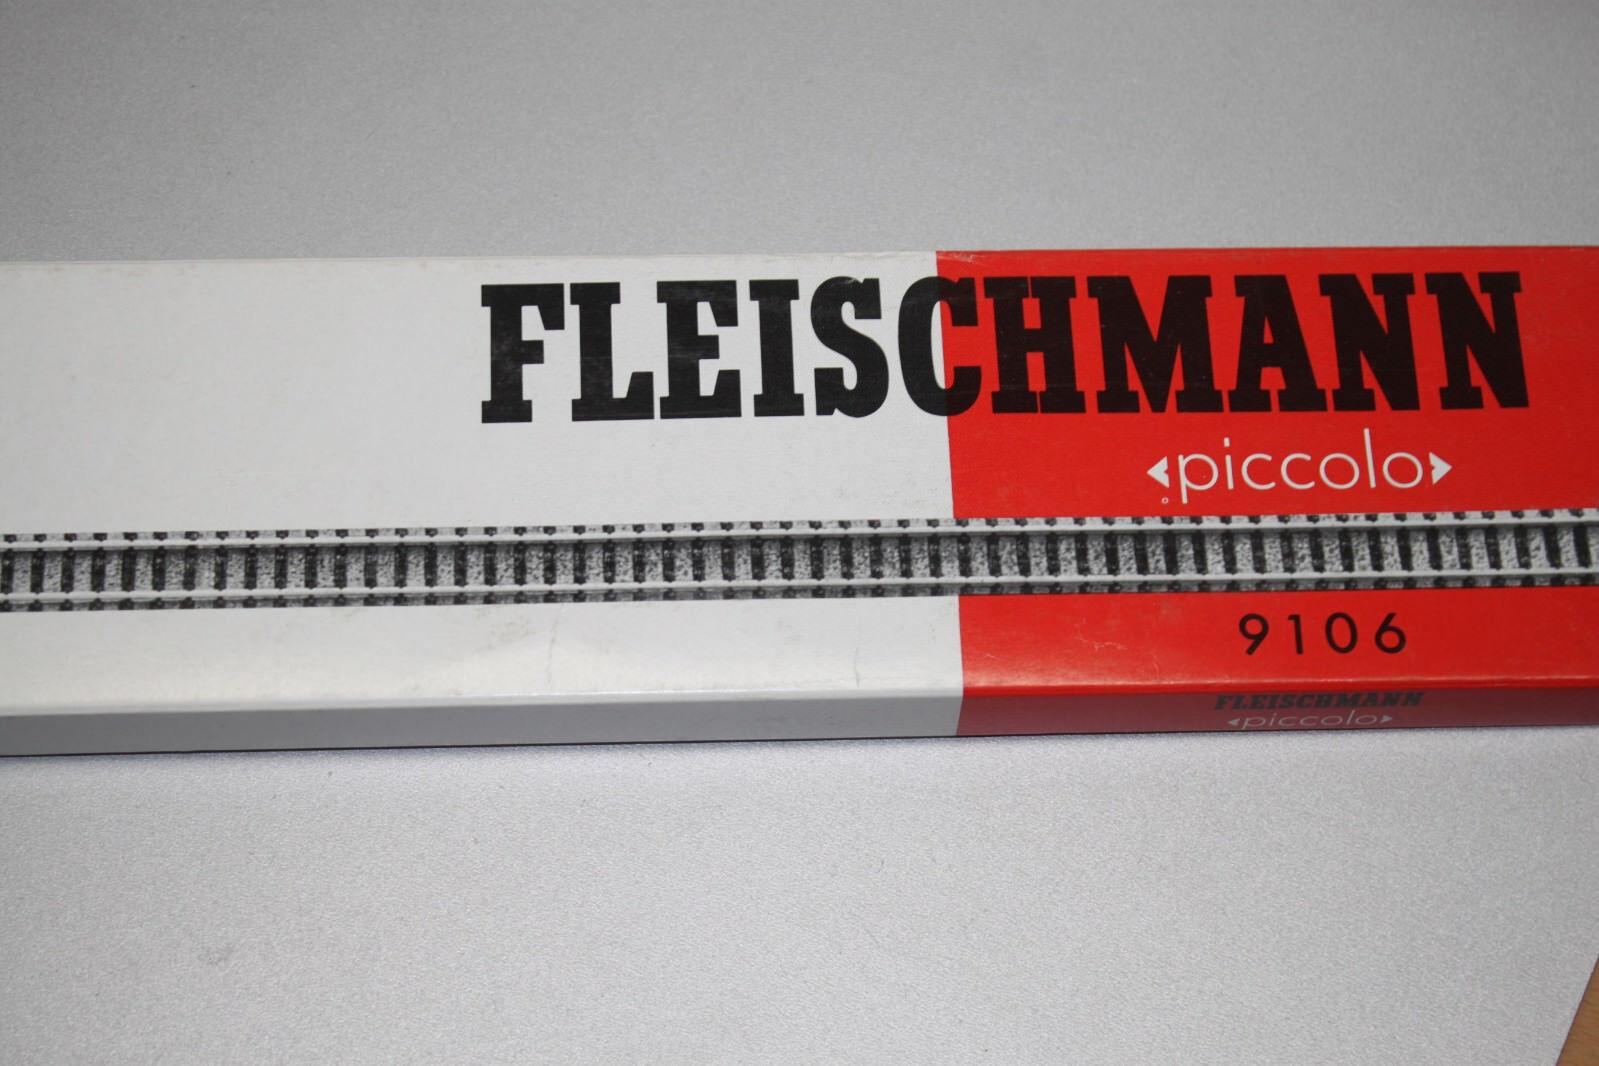 Fleischmann 9106 20 unid. flexible vía cuanto 777mm pista n OVP